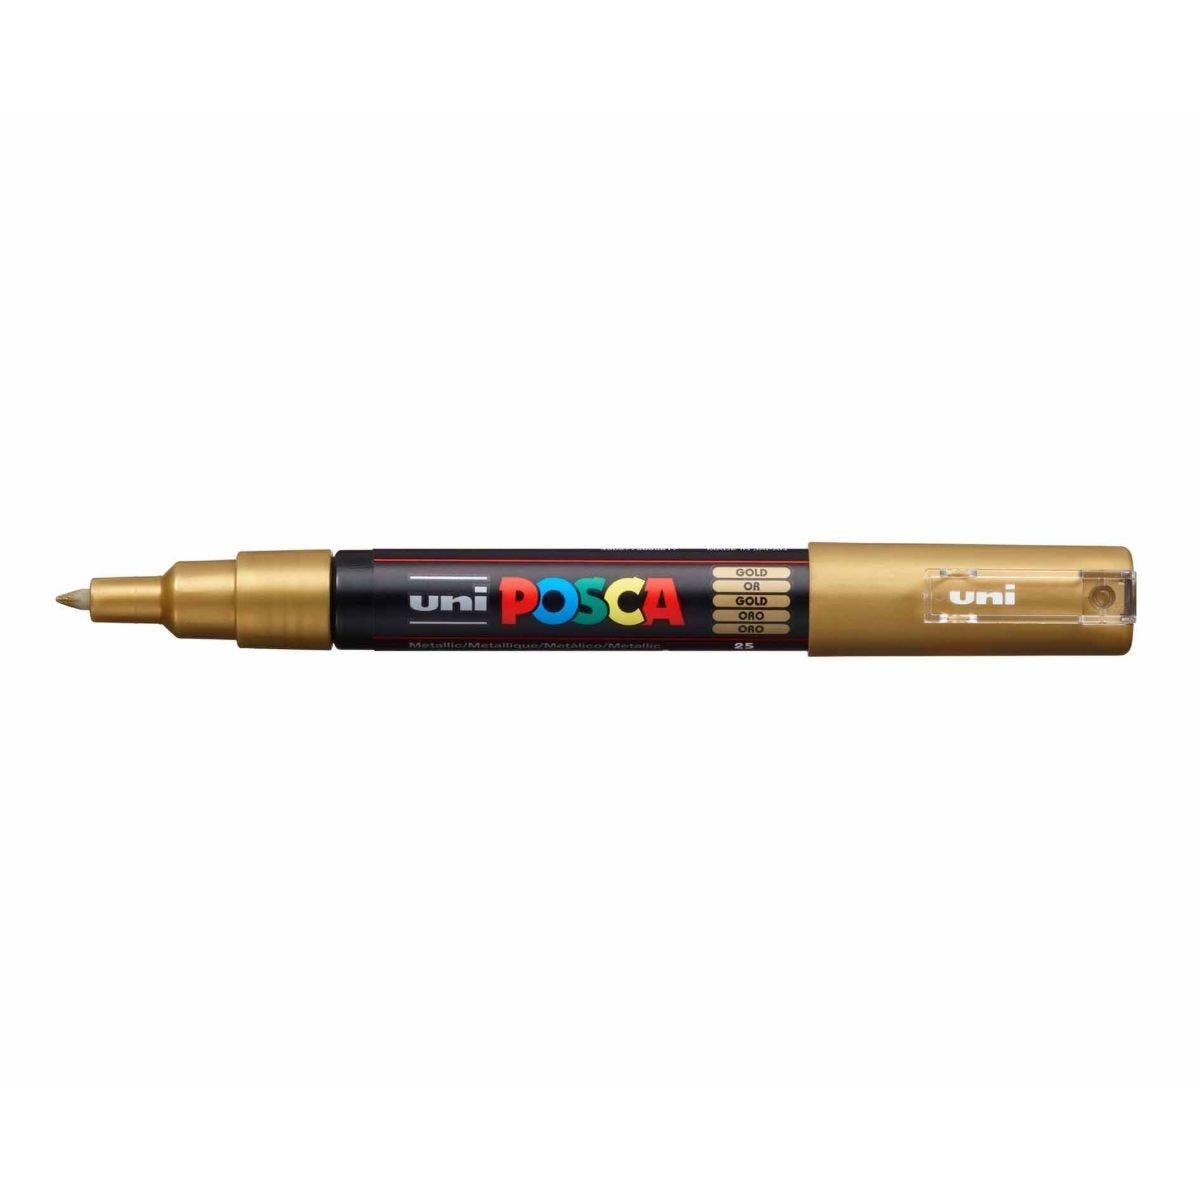 Uni Posca Marker Pen 0.7mm Bullet Tip PC-1M Gold